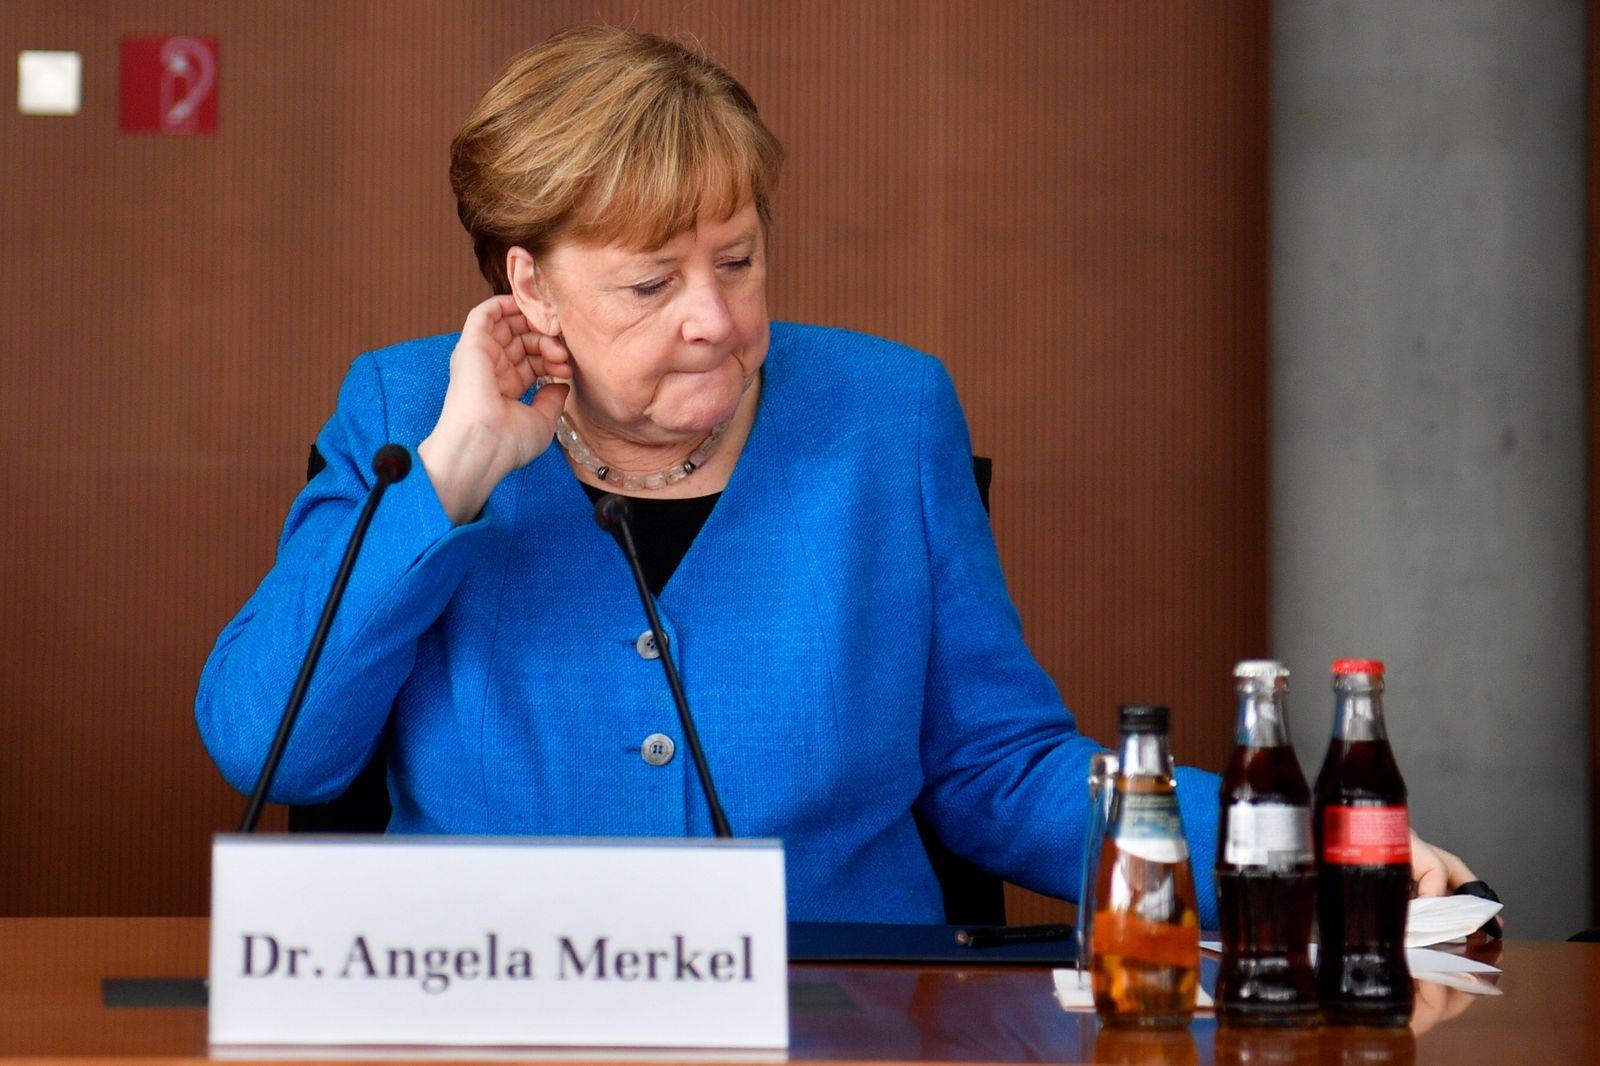 German Chancellor Merkel to testify on Wirecard